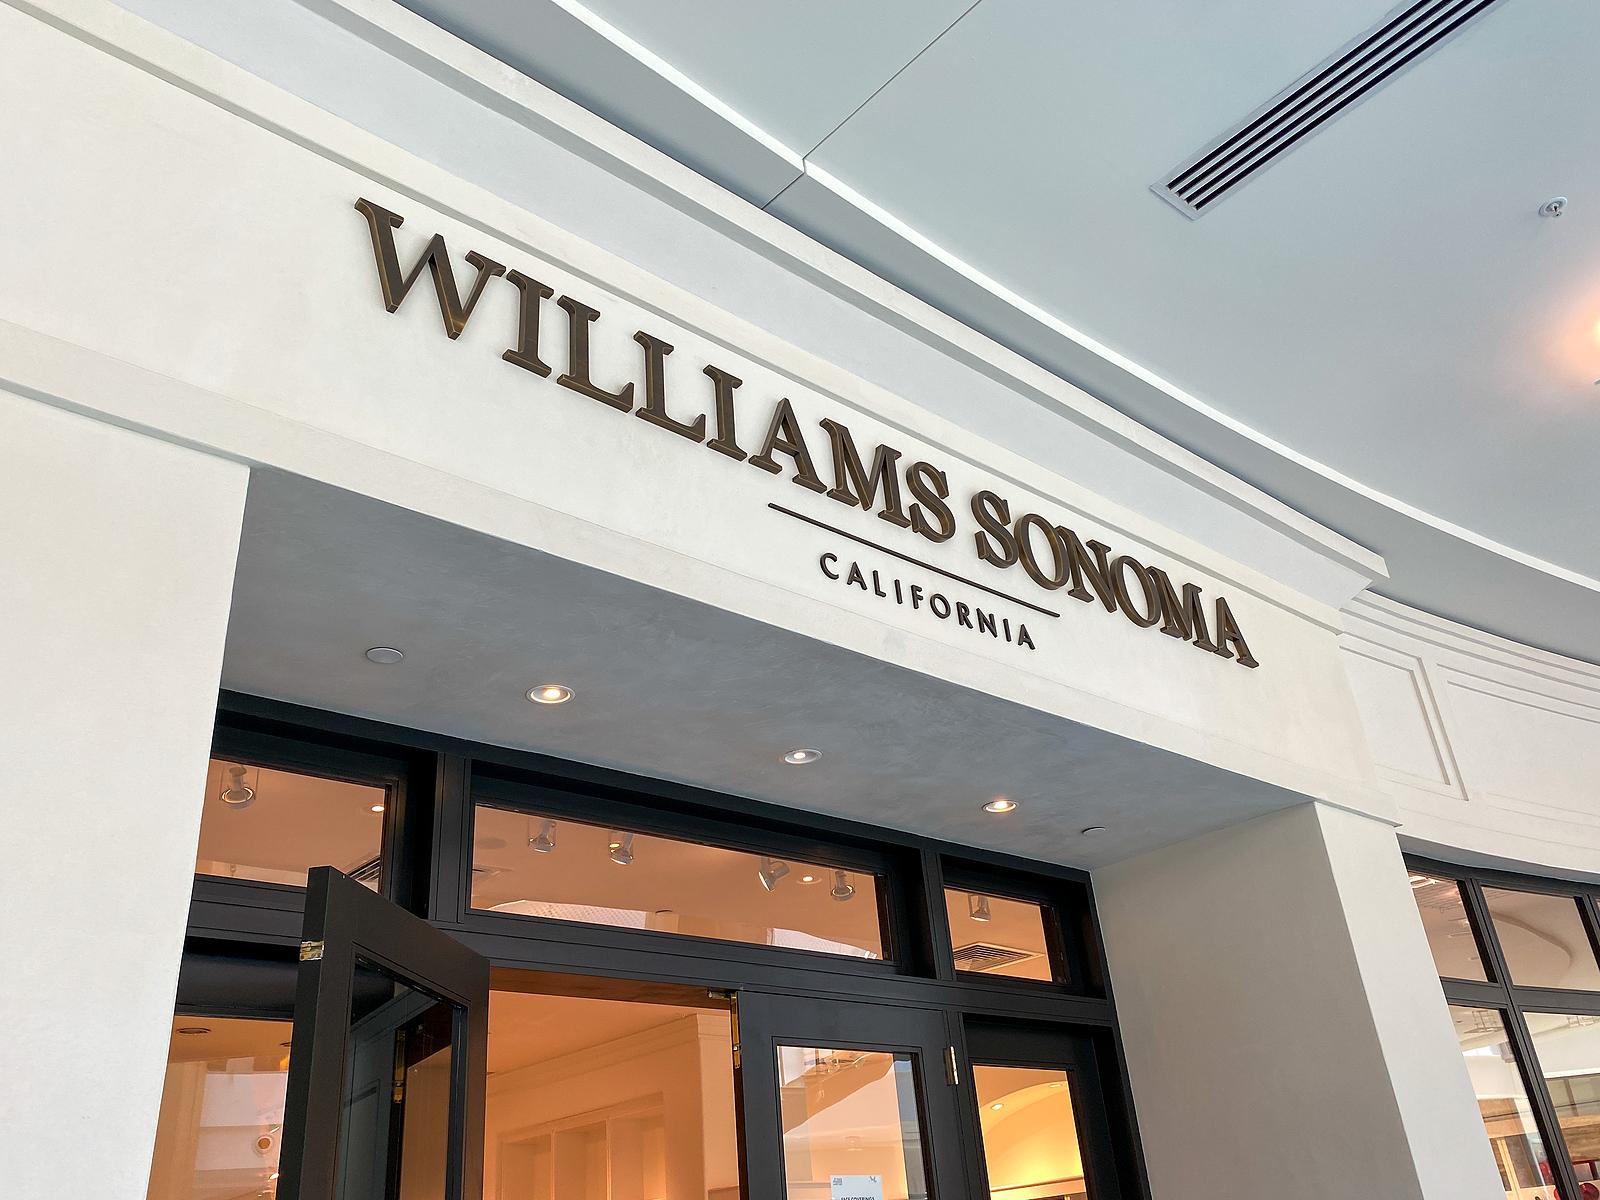 Williams Sonoma WSM stock news and analysis